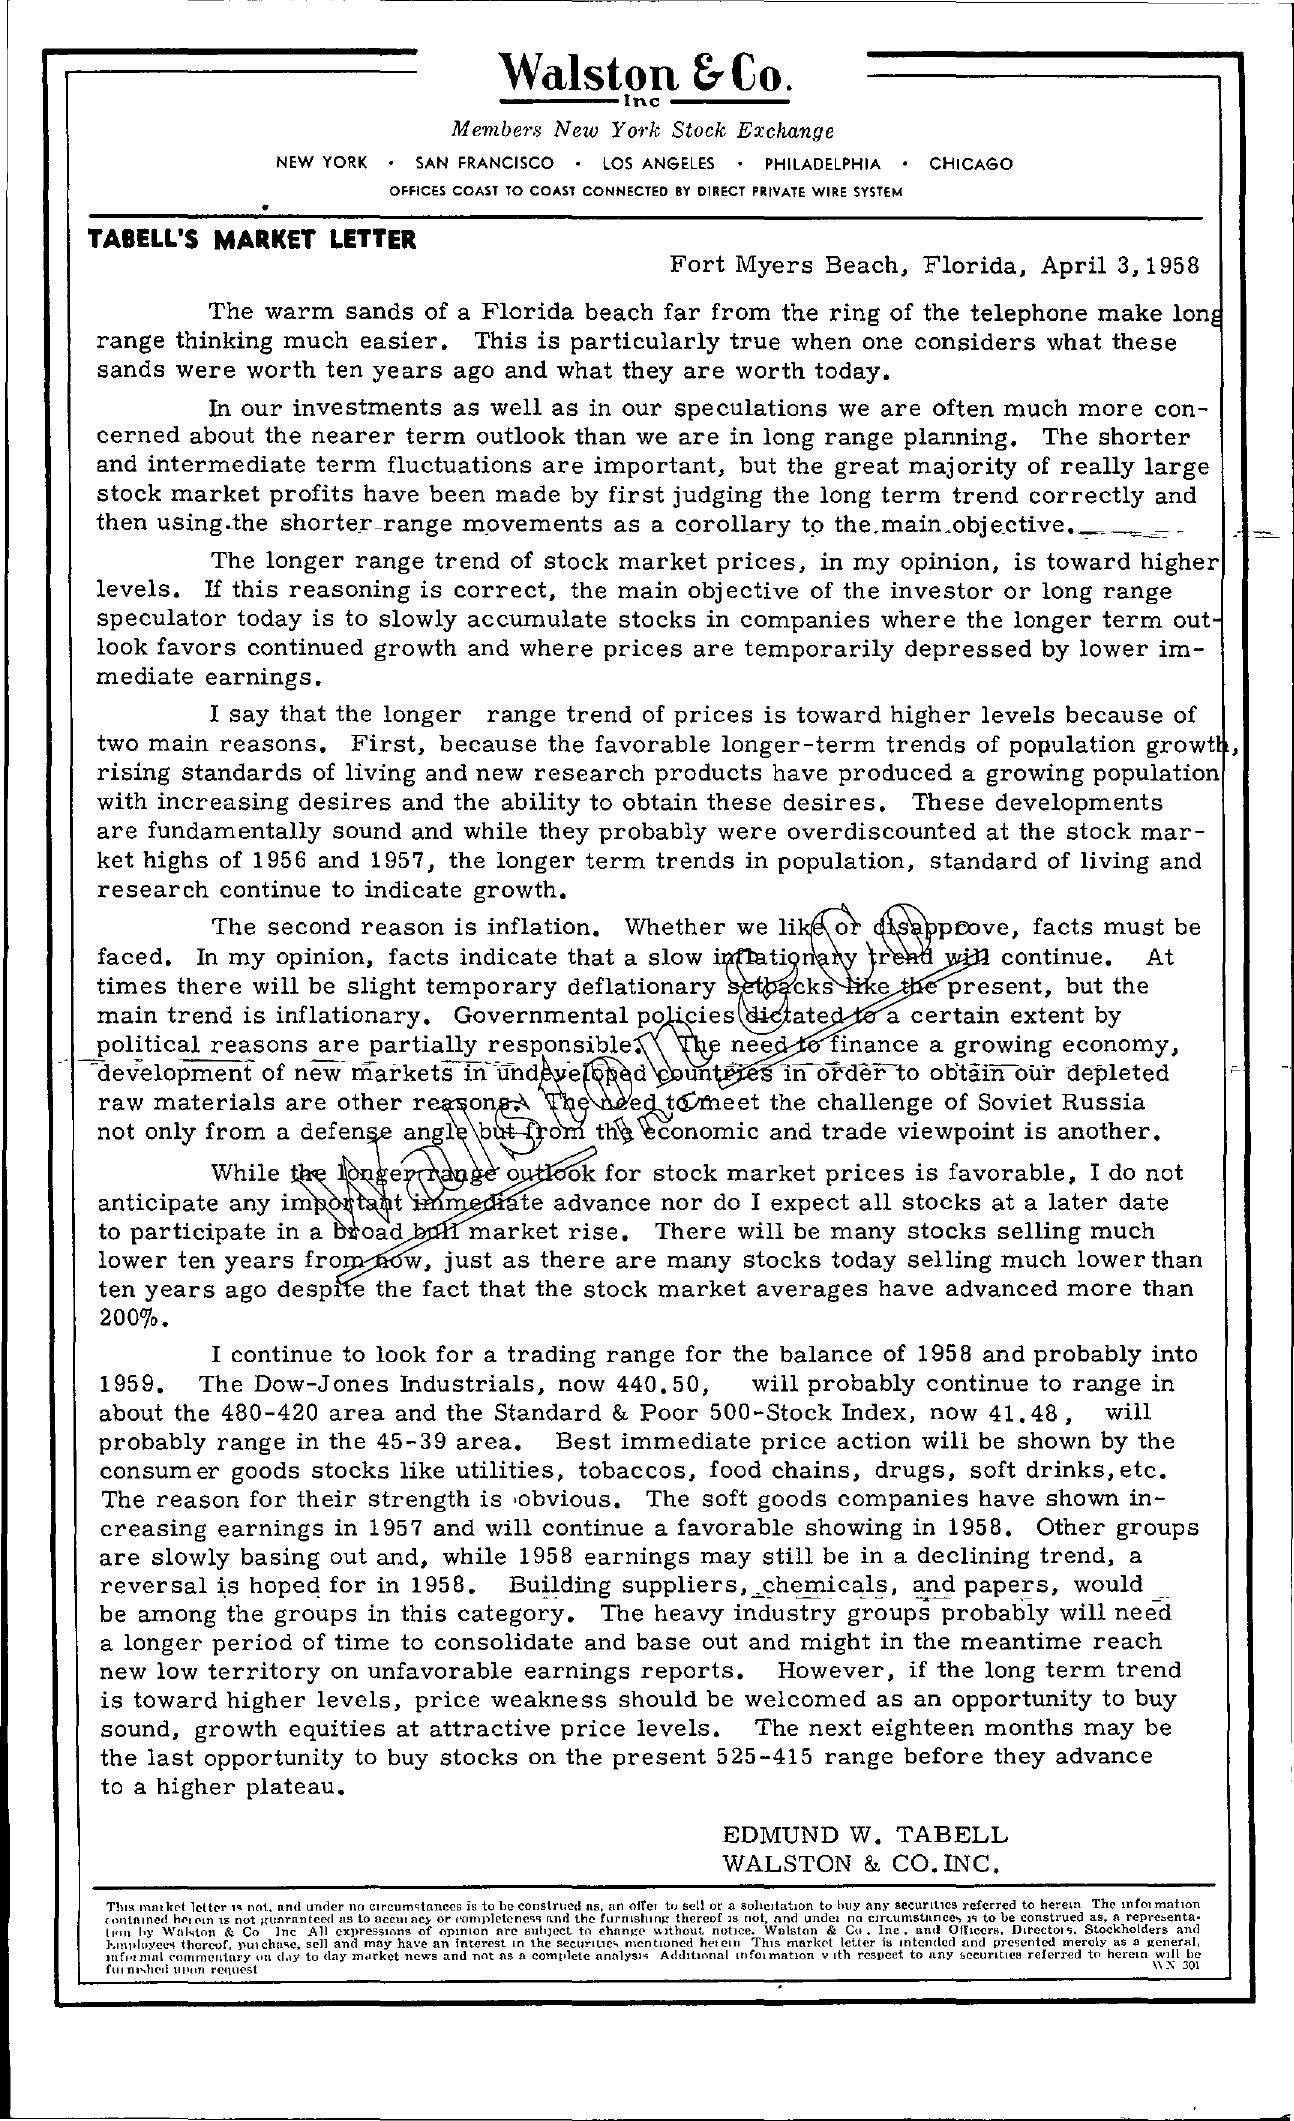 Tabell's Market Letter - April 03, 1958